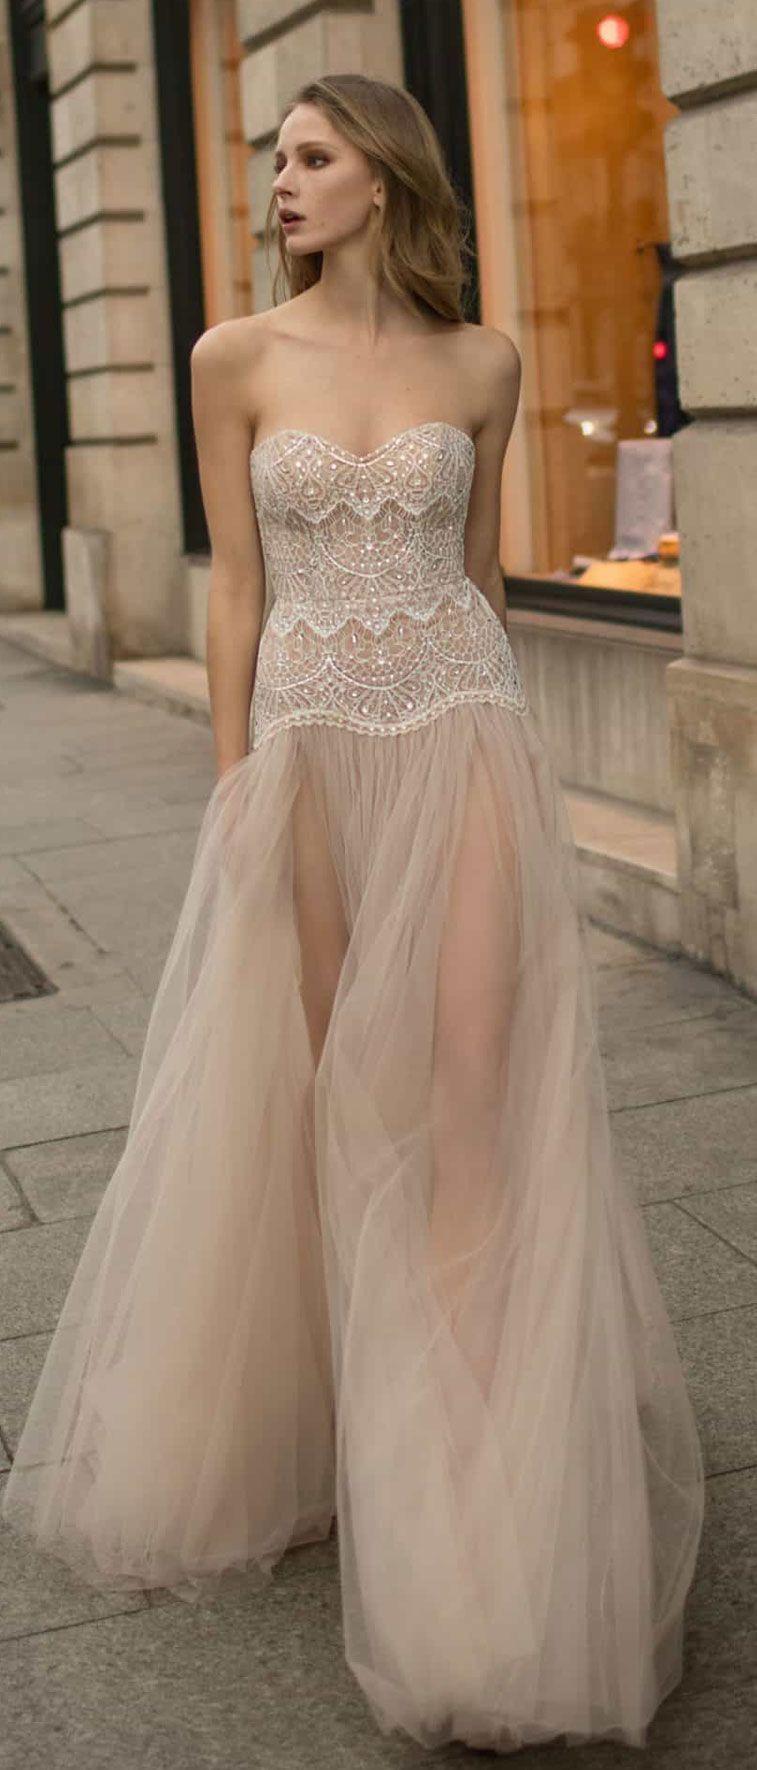 Eisen Stein Wedding Dresses Light Feather Bridal Collection